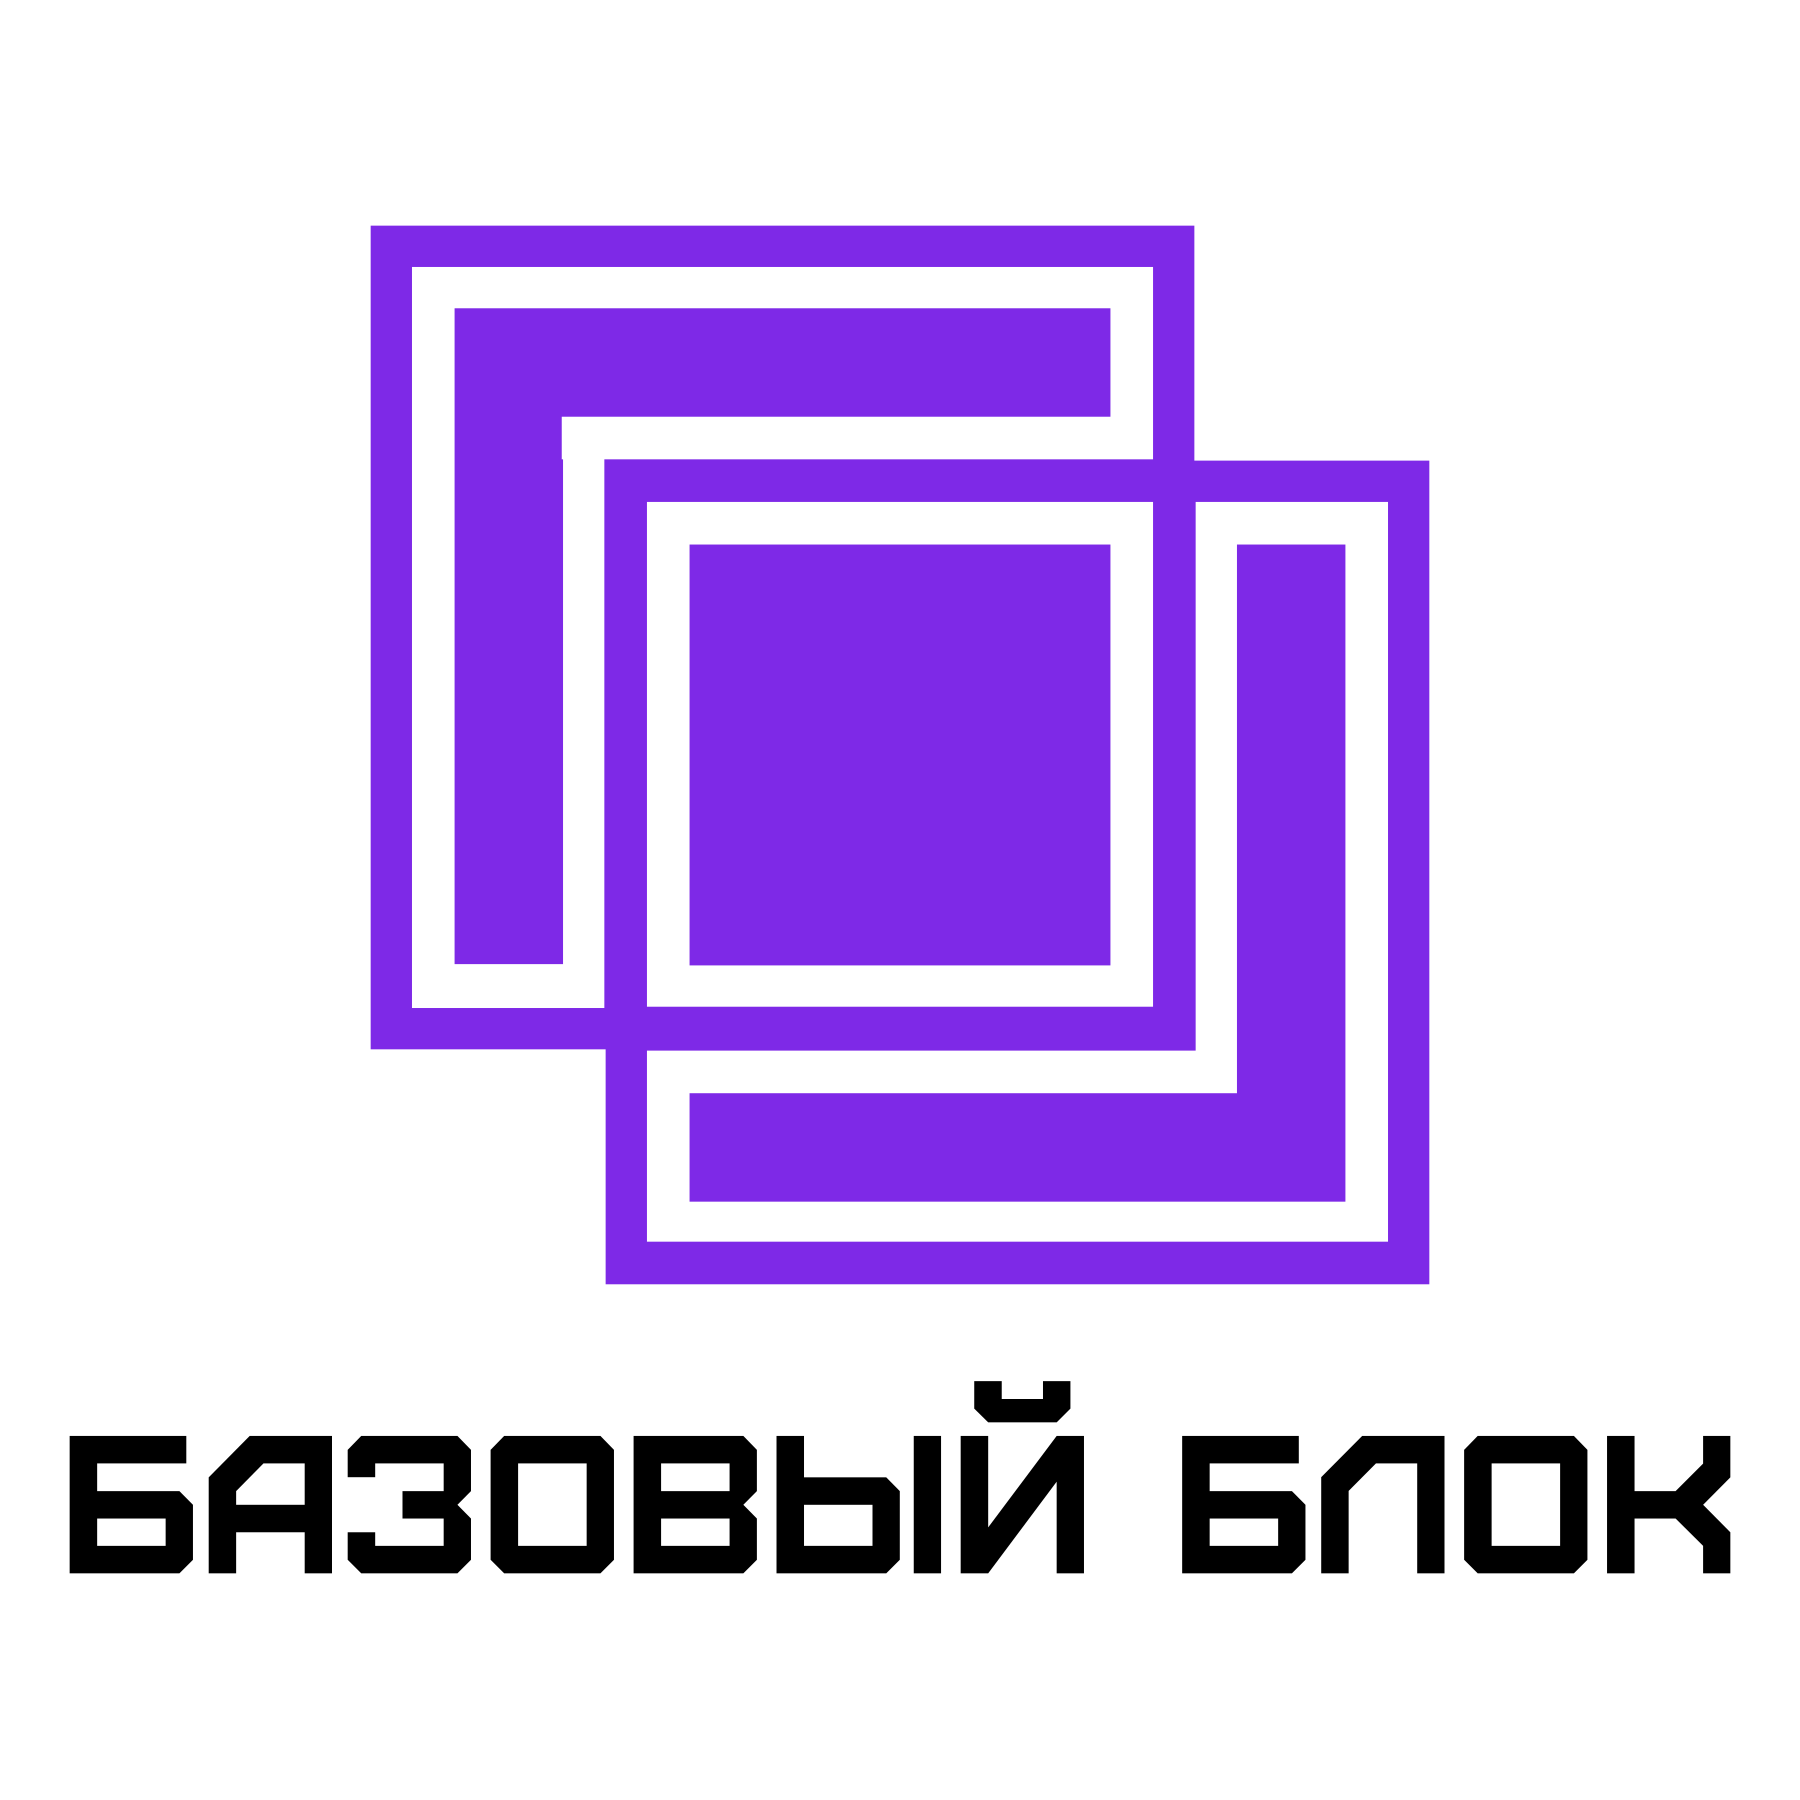 Базовый Блок: подкаст про блокчейн show art